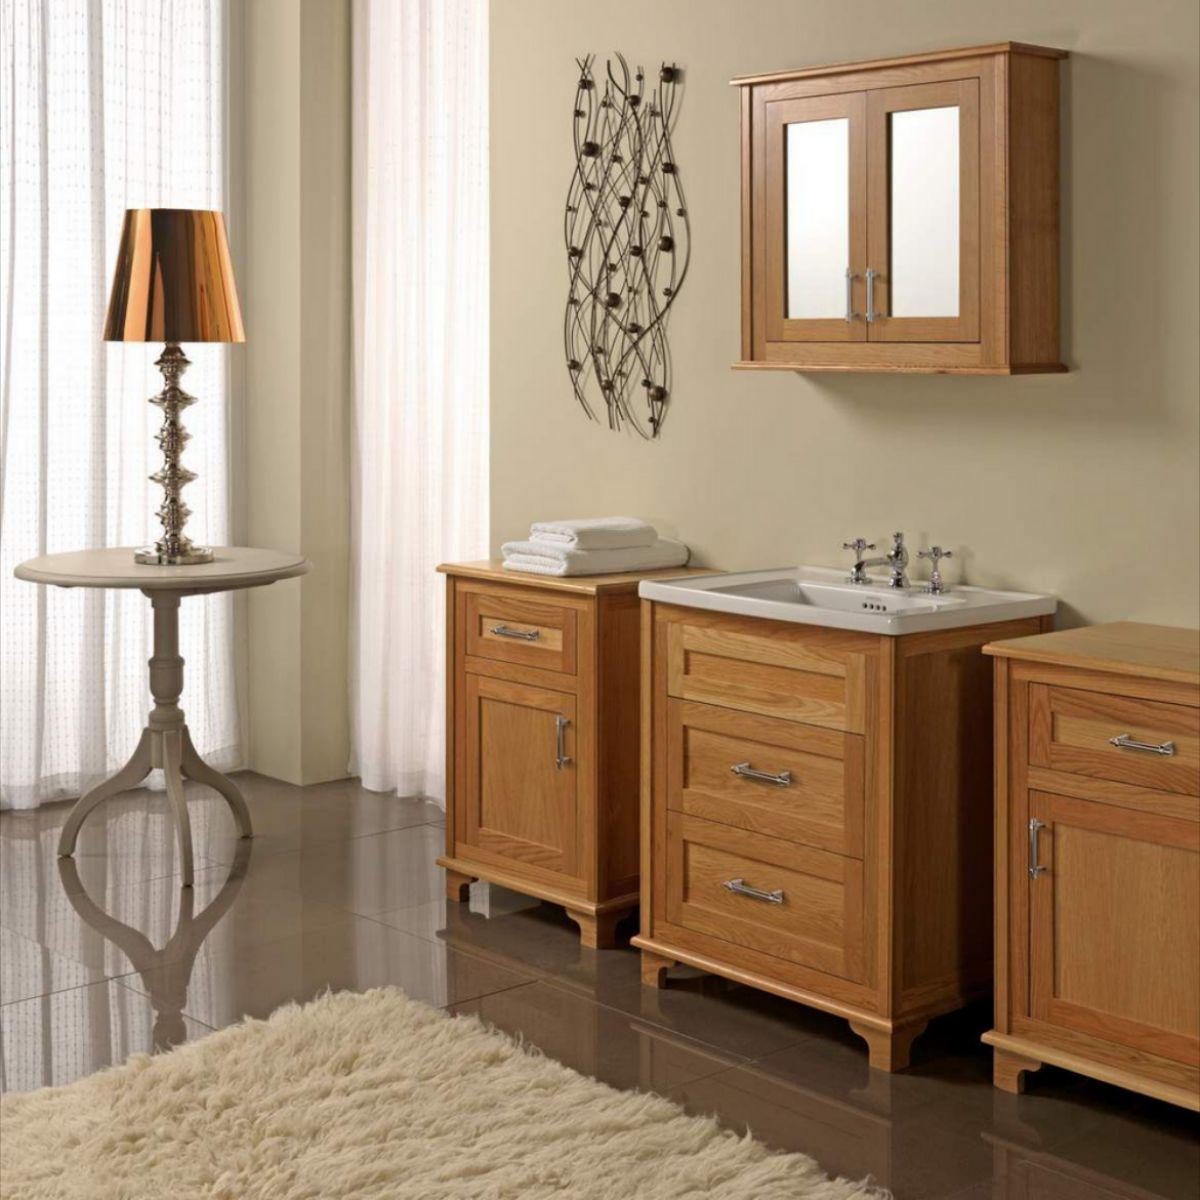 Imperial Radcliffe Thurlestone 2 Drawer Vanity Unit Uk Bathrooms